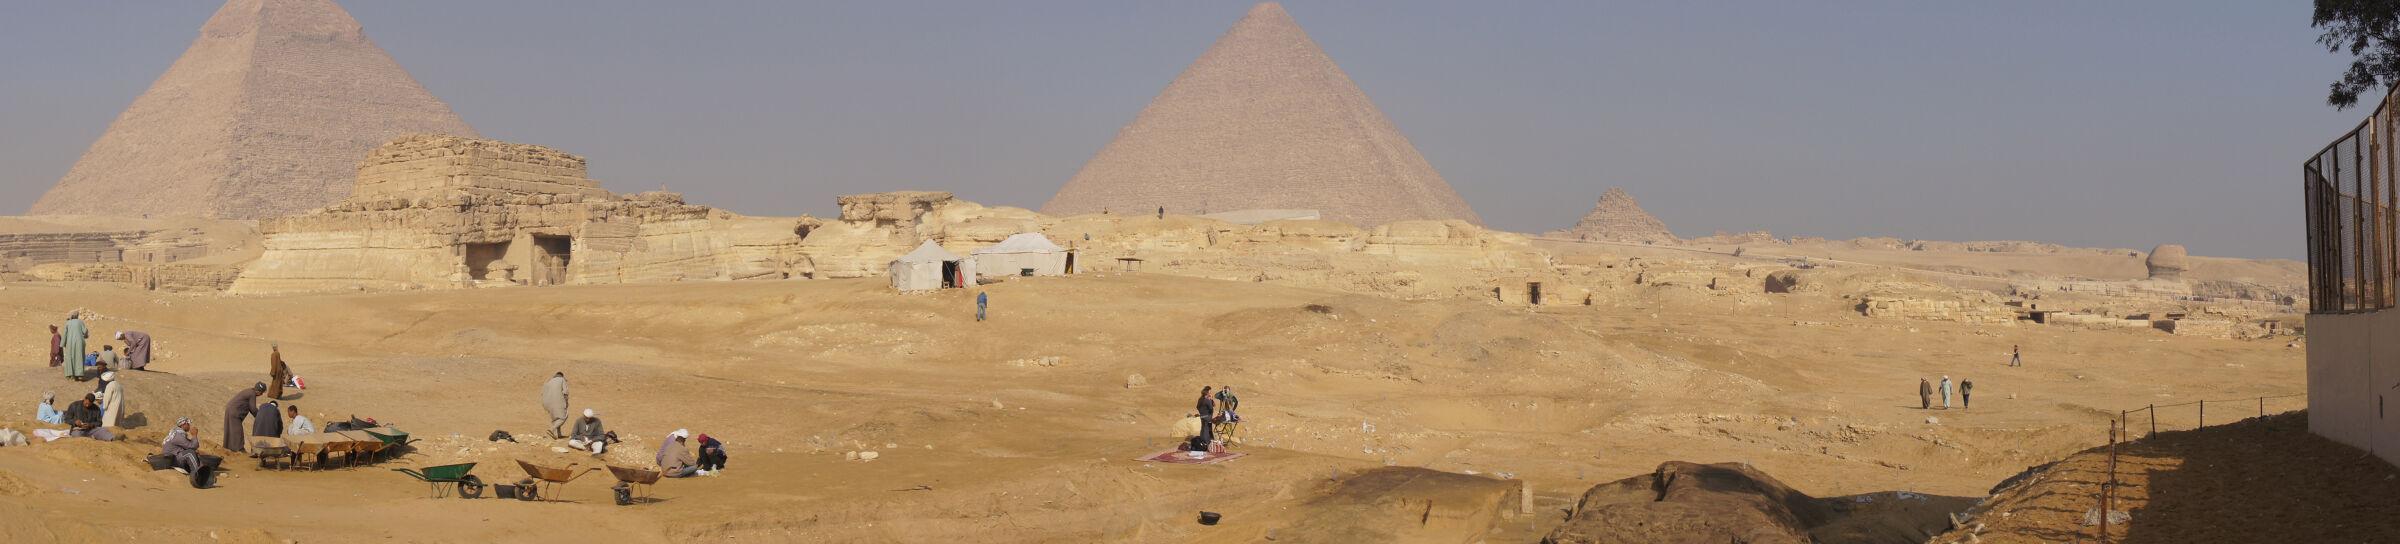 Menkaure Pyramid Complex: Site: Giza; View: Menkaure Valley Temple, G 8400, Khafre Pyramid, Khufu Pyramid